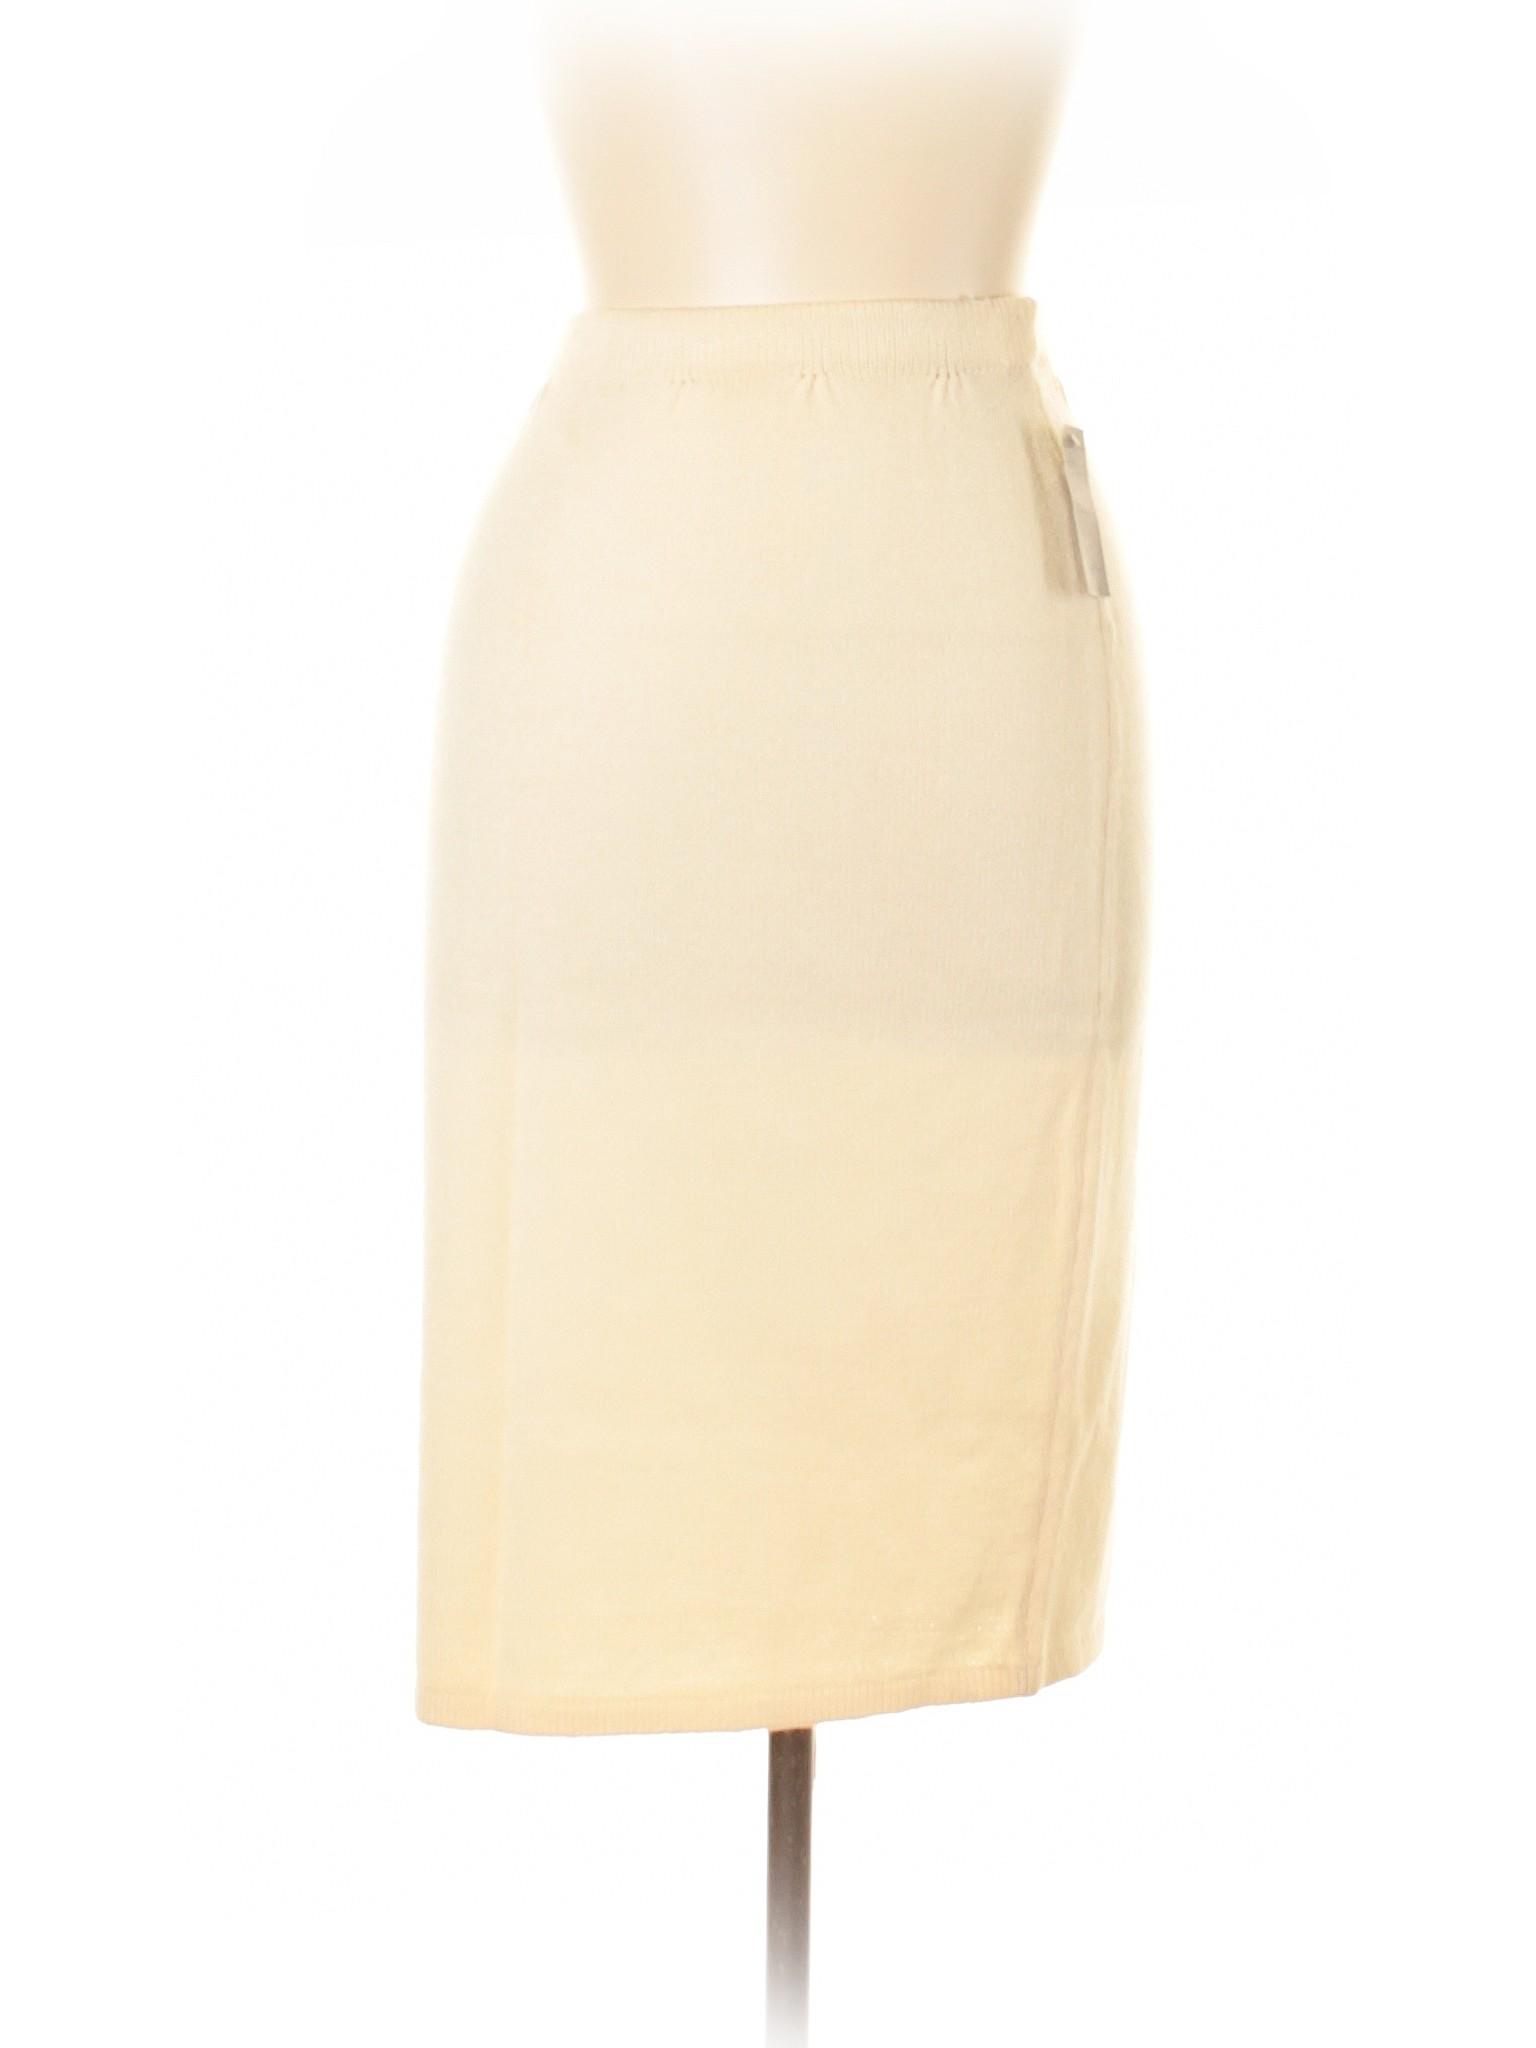 Skirt Boutique Boutique Casual Casual Boutique Casual Boutique Skirt Casual Boutique Skirt Skirt dq7xxXIY